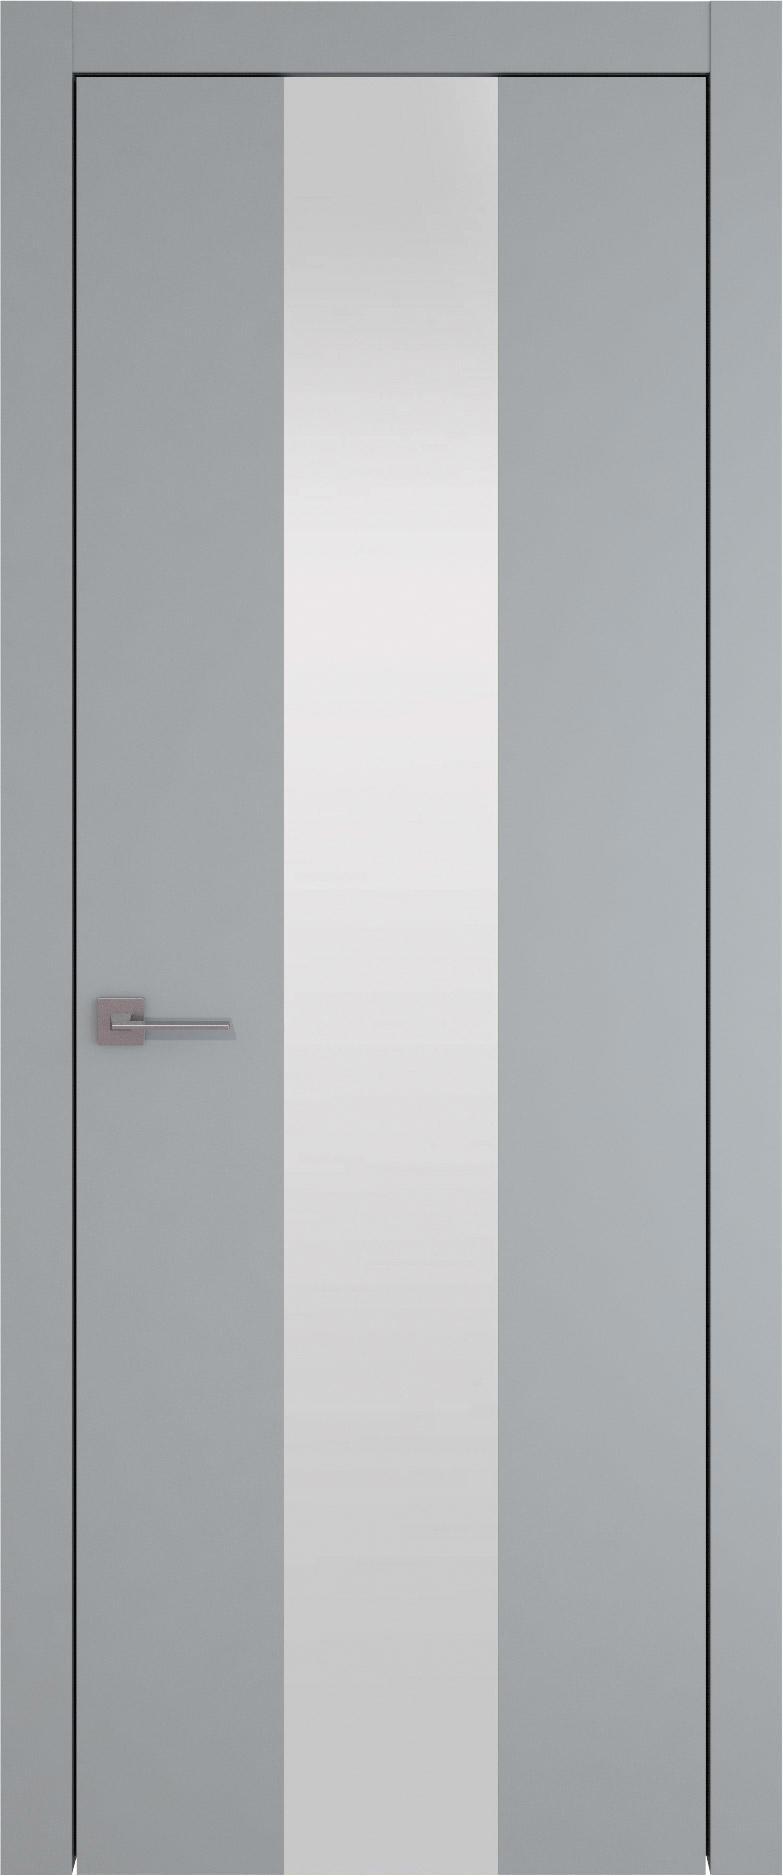 Tivoli Ж-1 цвет - Серебристо-серая эмаль (RAL 7045) Со стеклом (ДО)